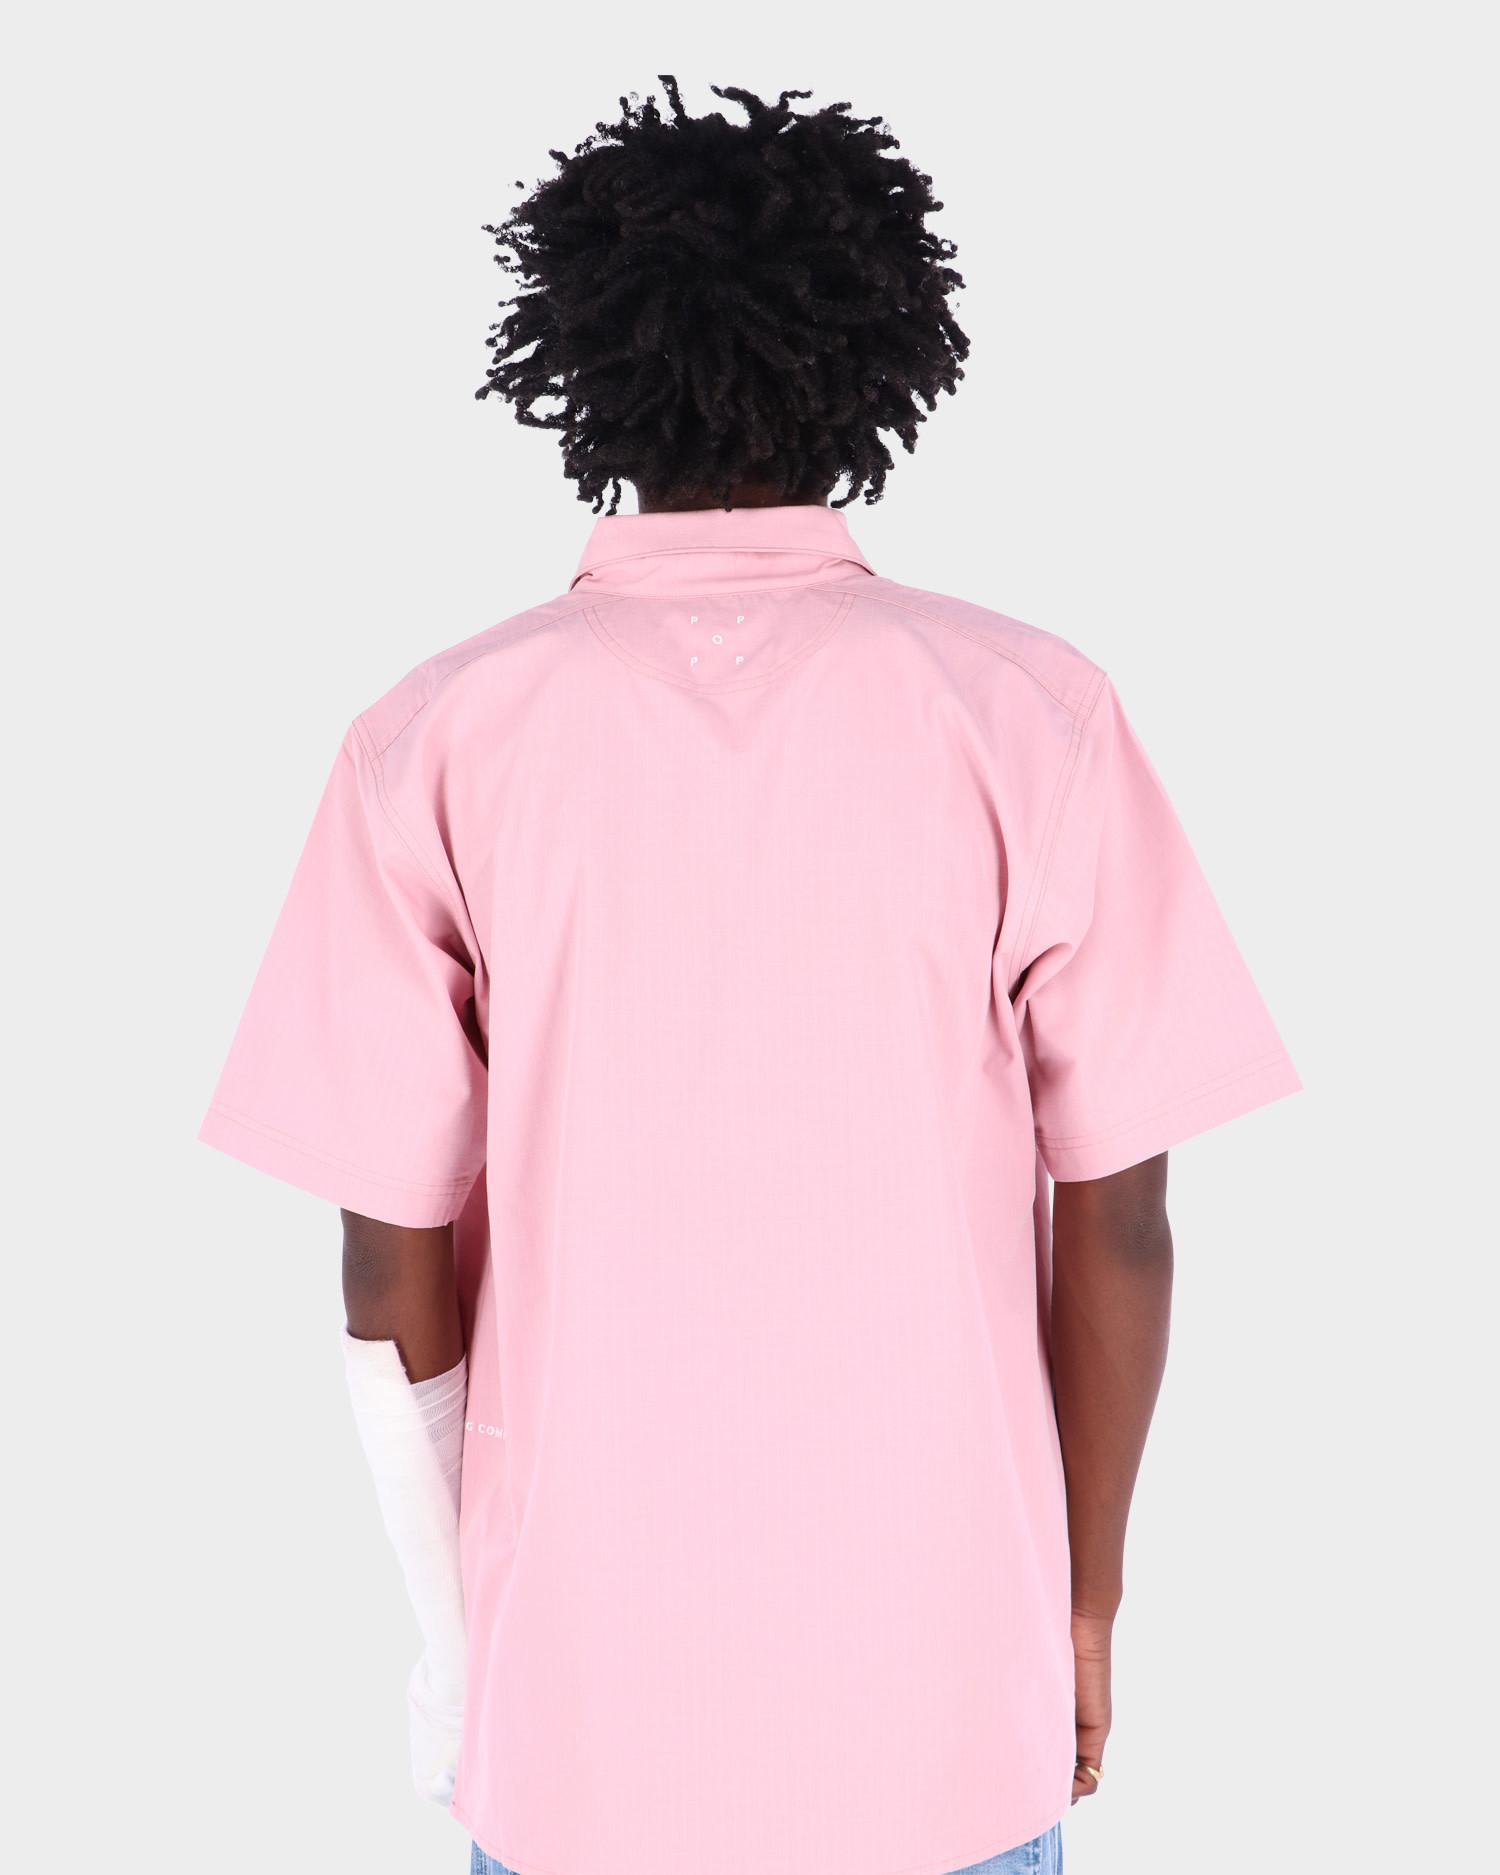 Pop Trading Co Italo Shortsleeve Shirt Zephyr